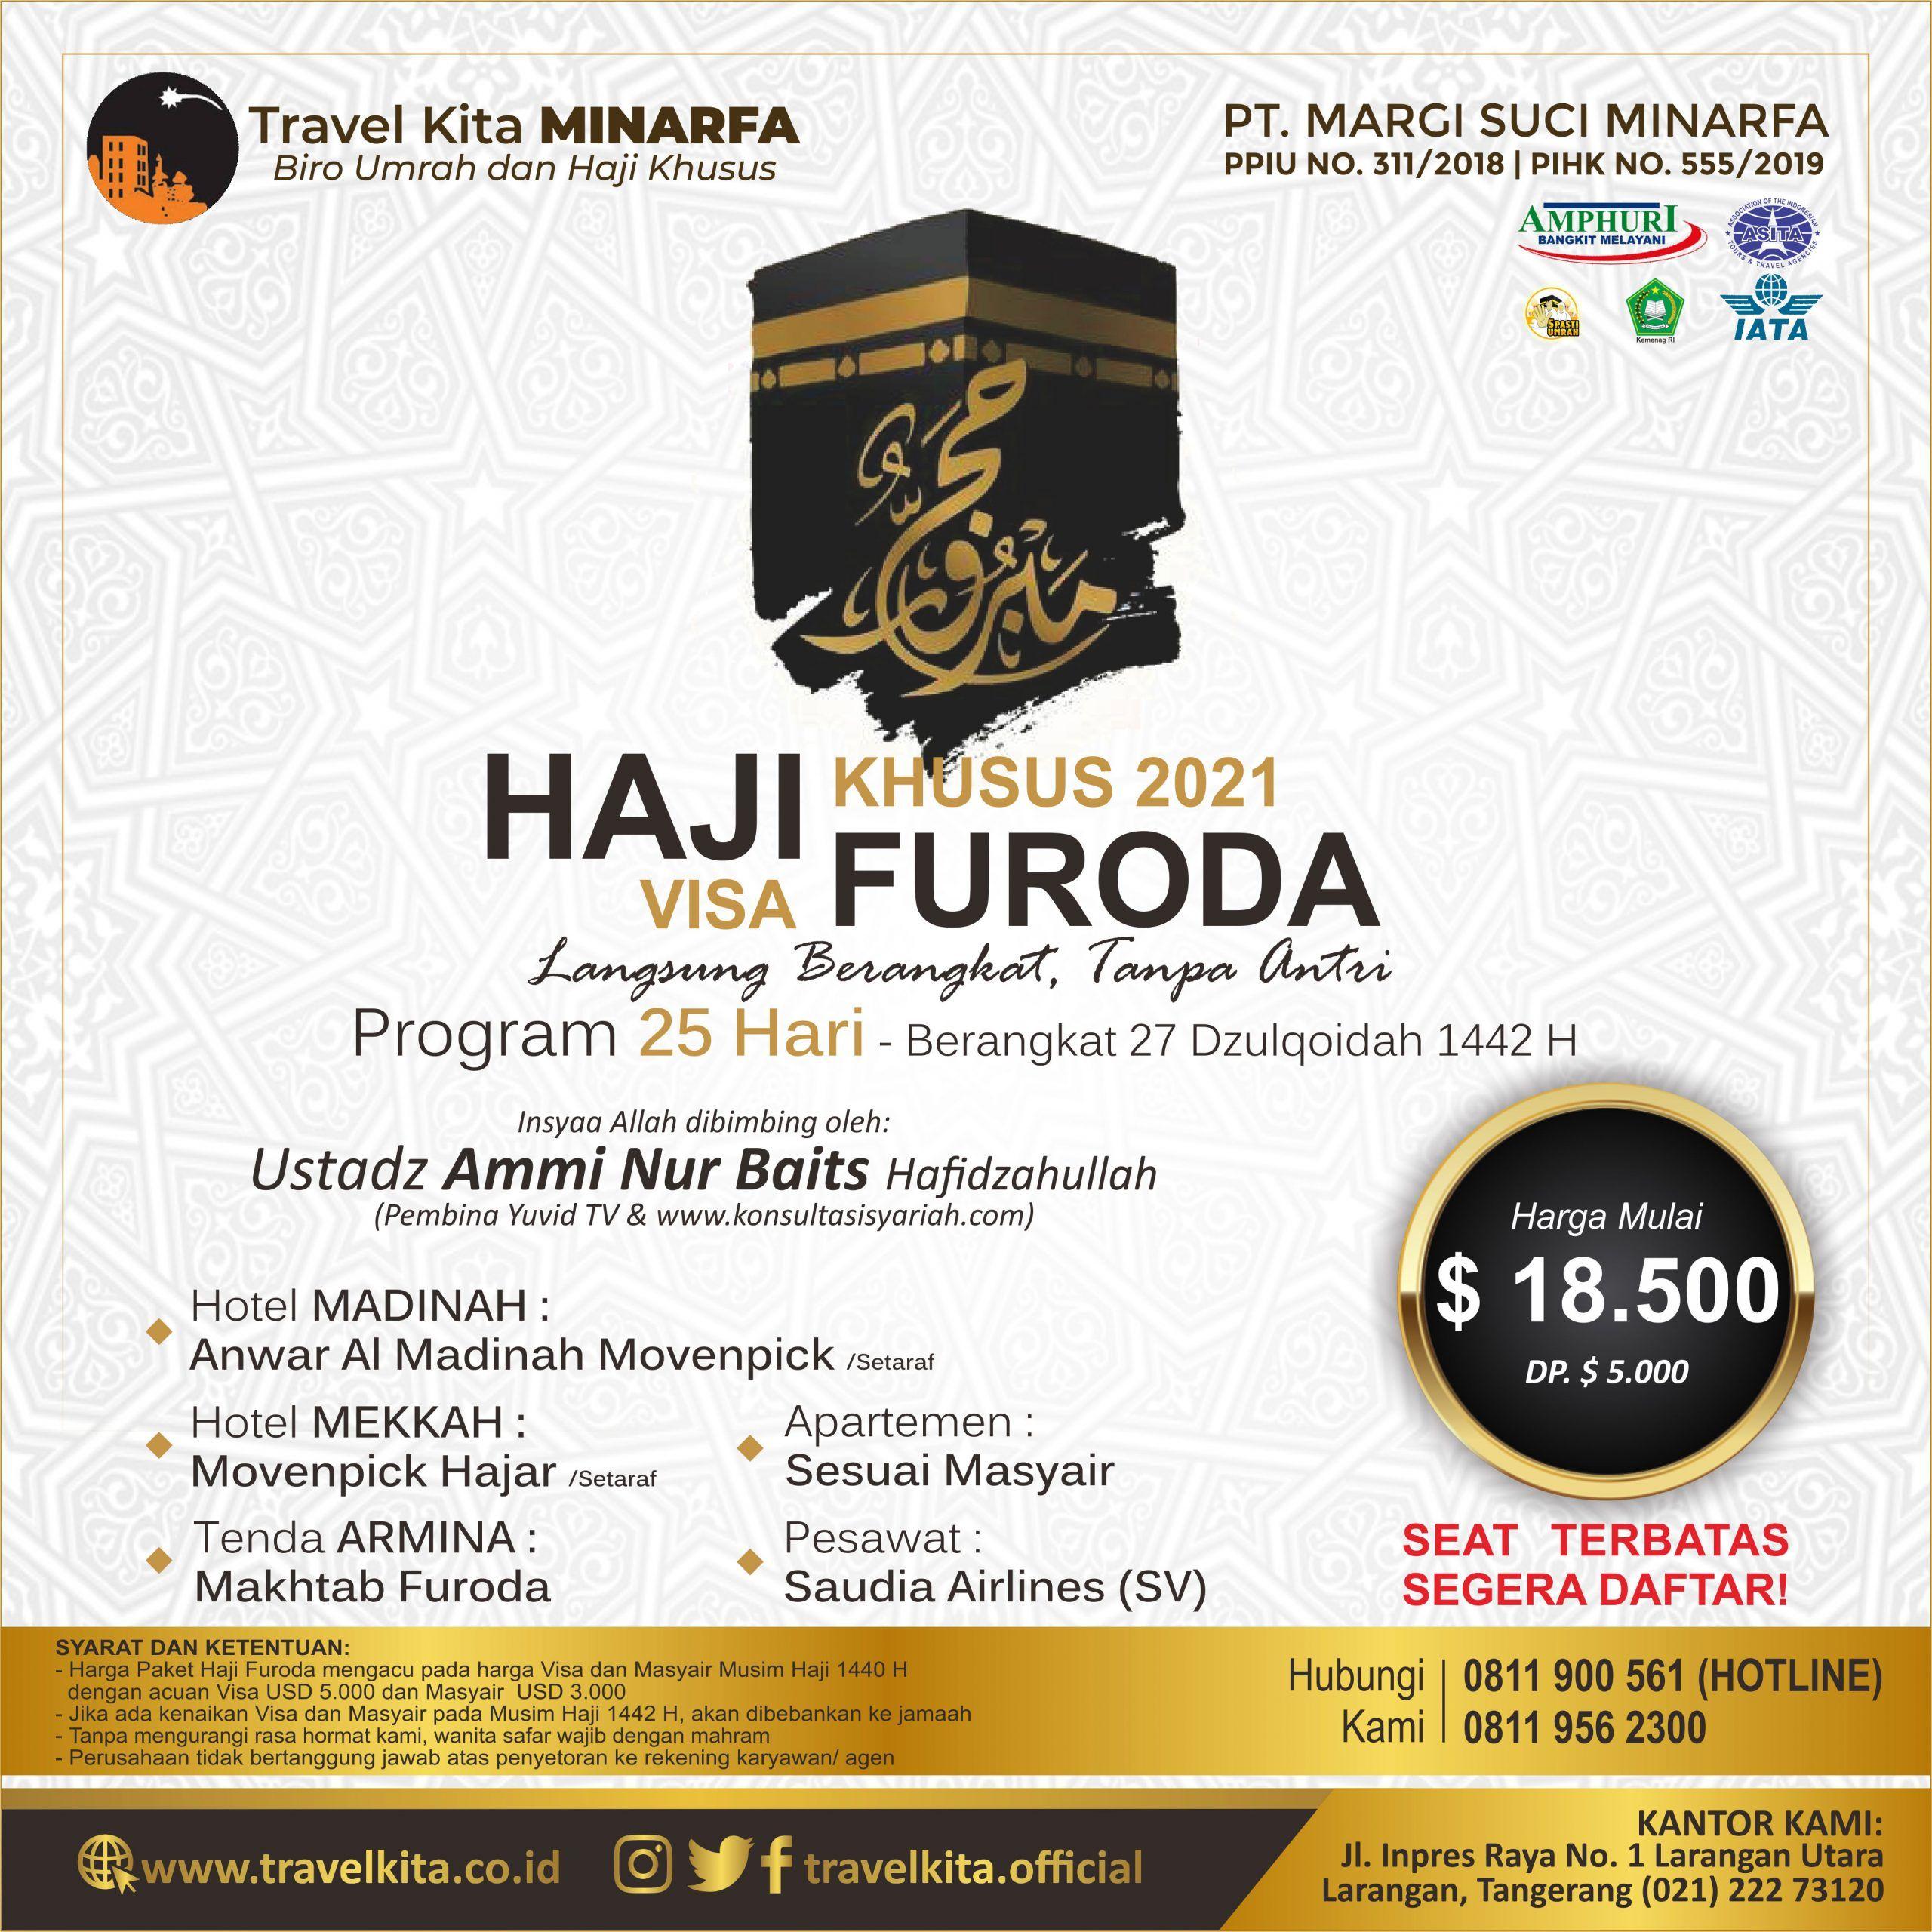 Haji Khusus Visa Furoda 1442 H